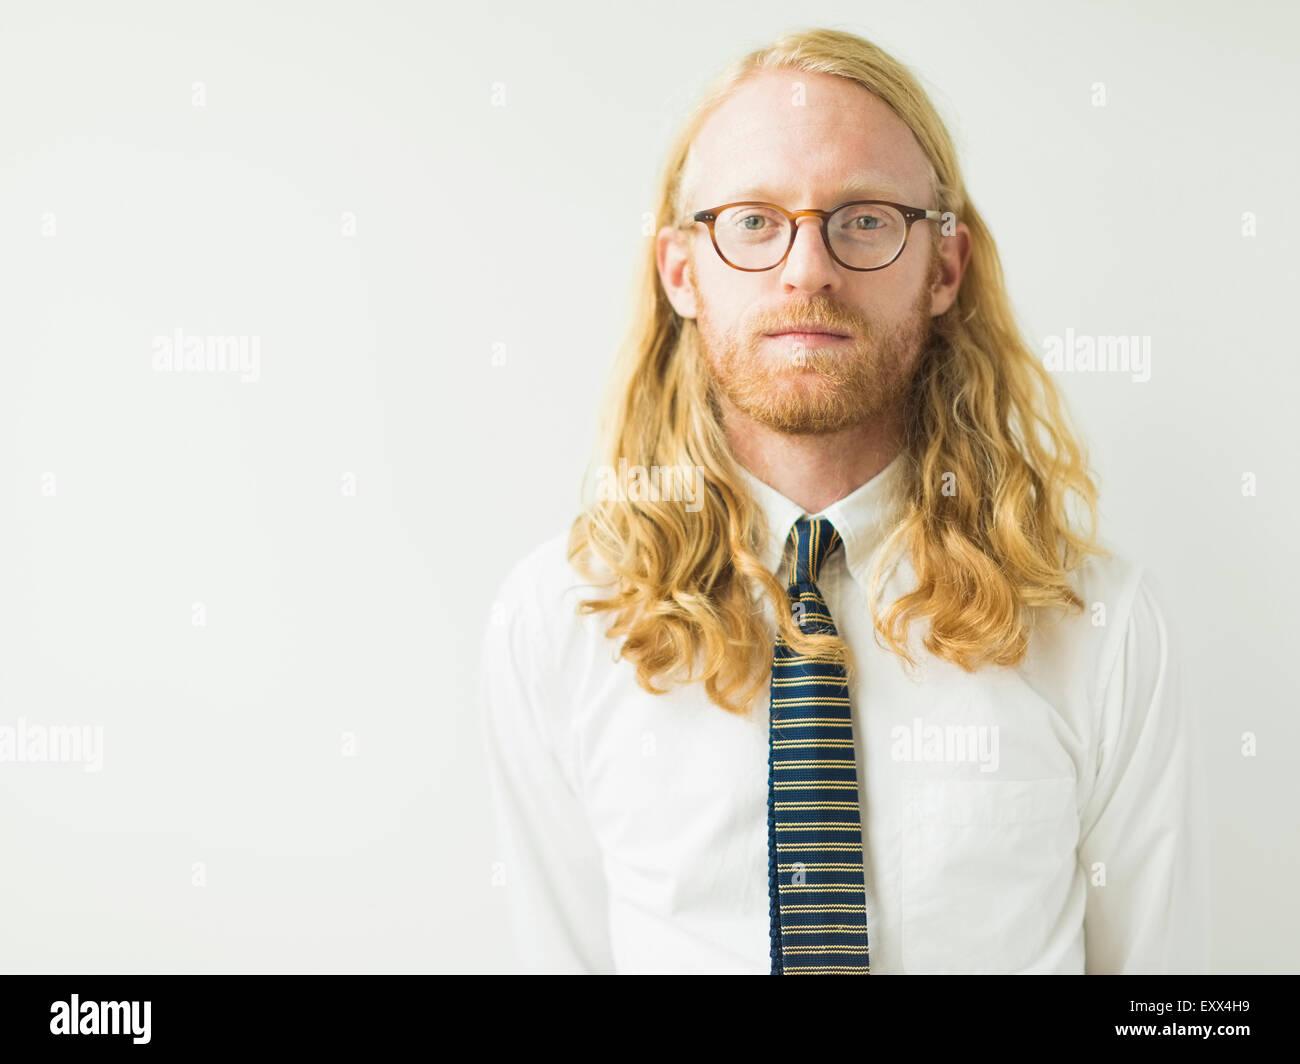 Portrait of blond man - Stock Image